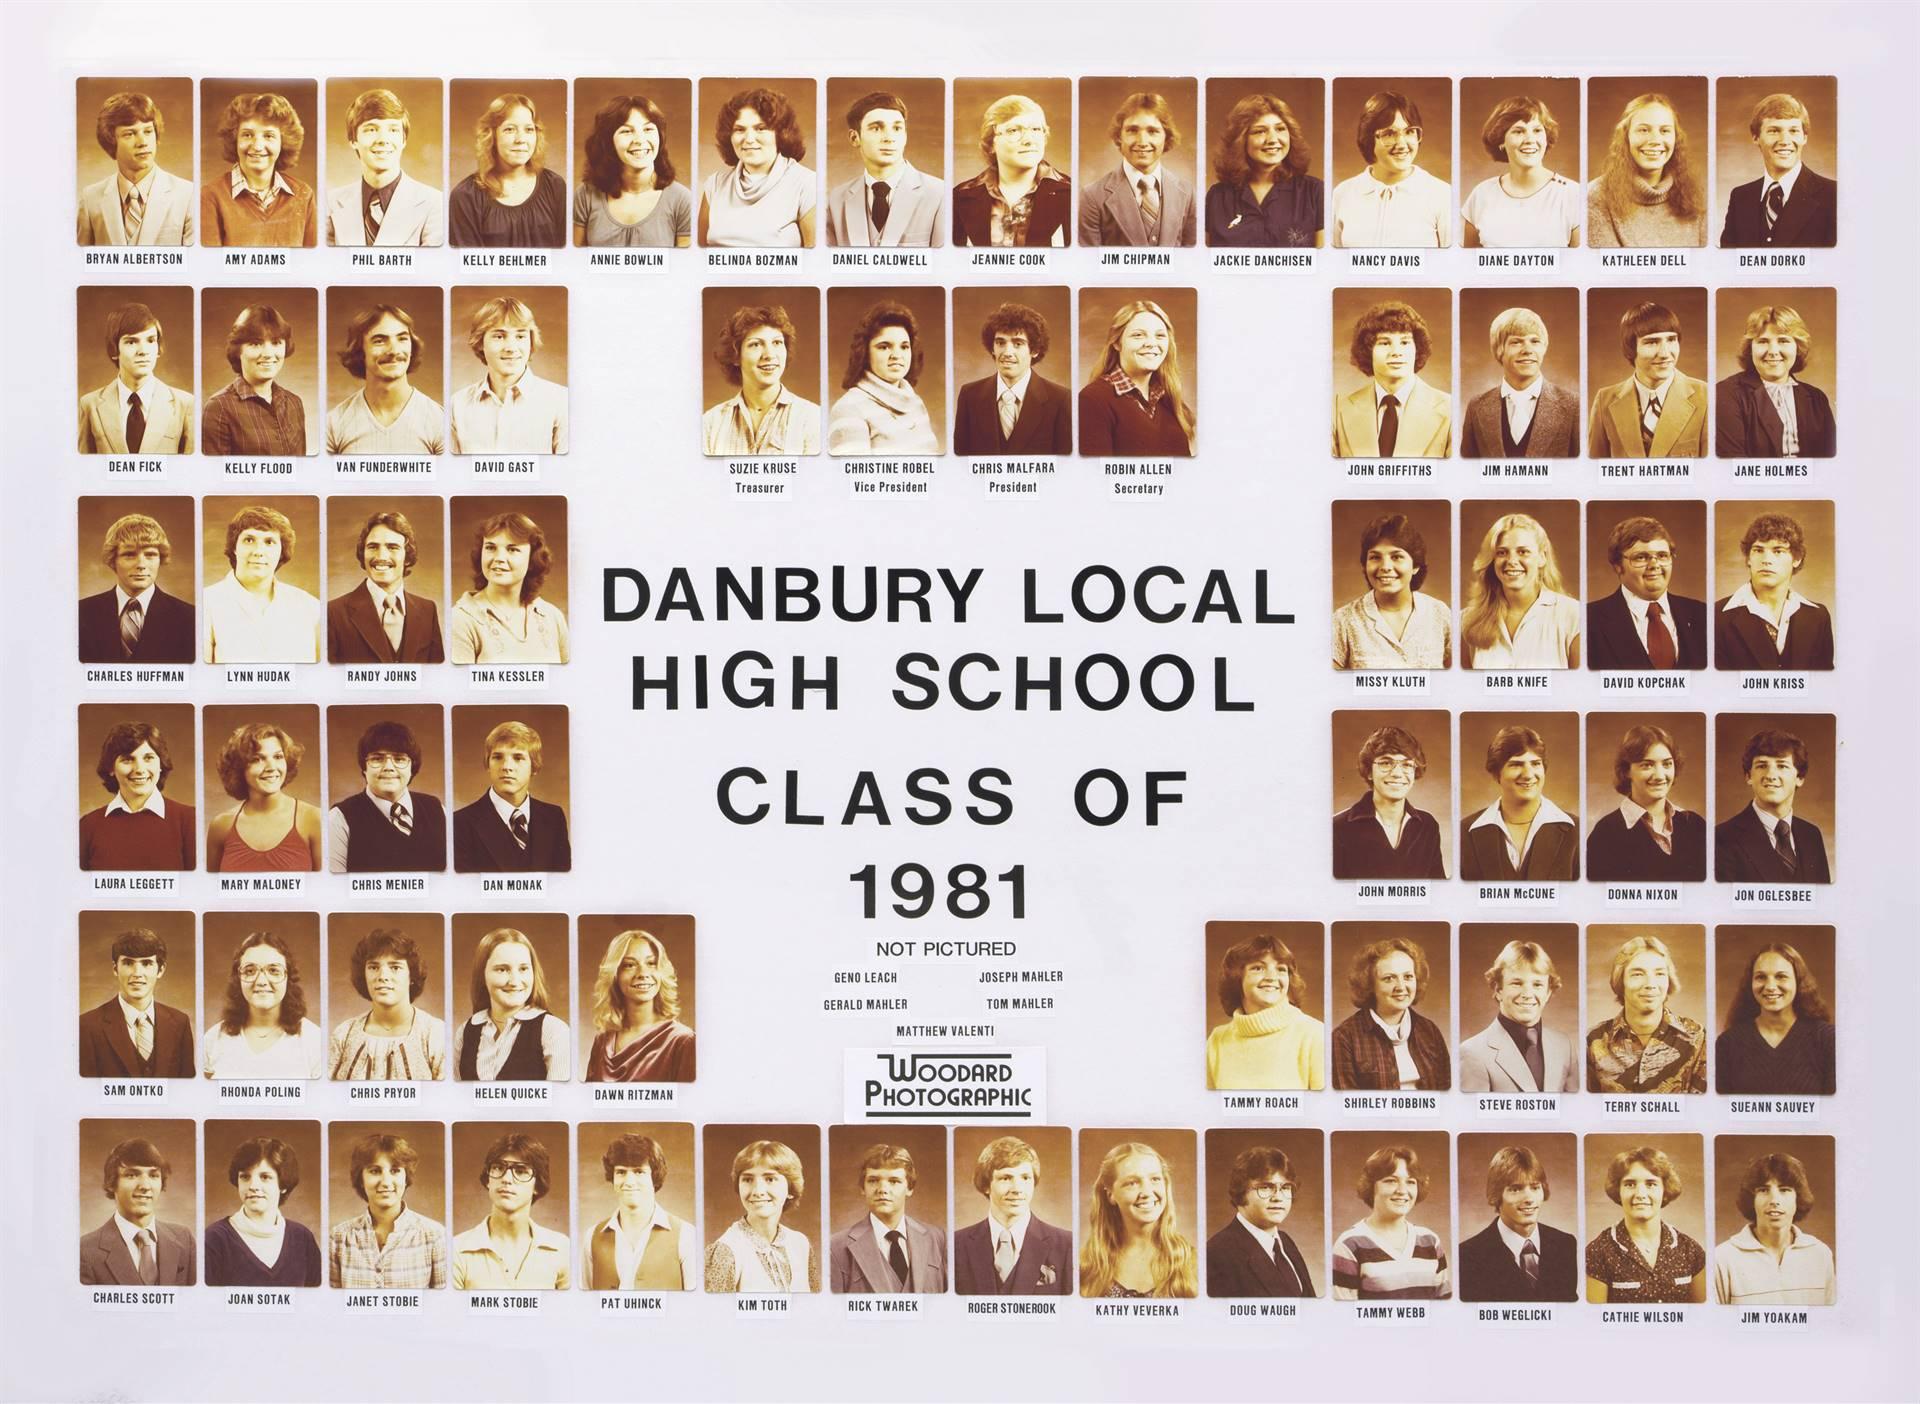 Class of 1981